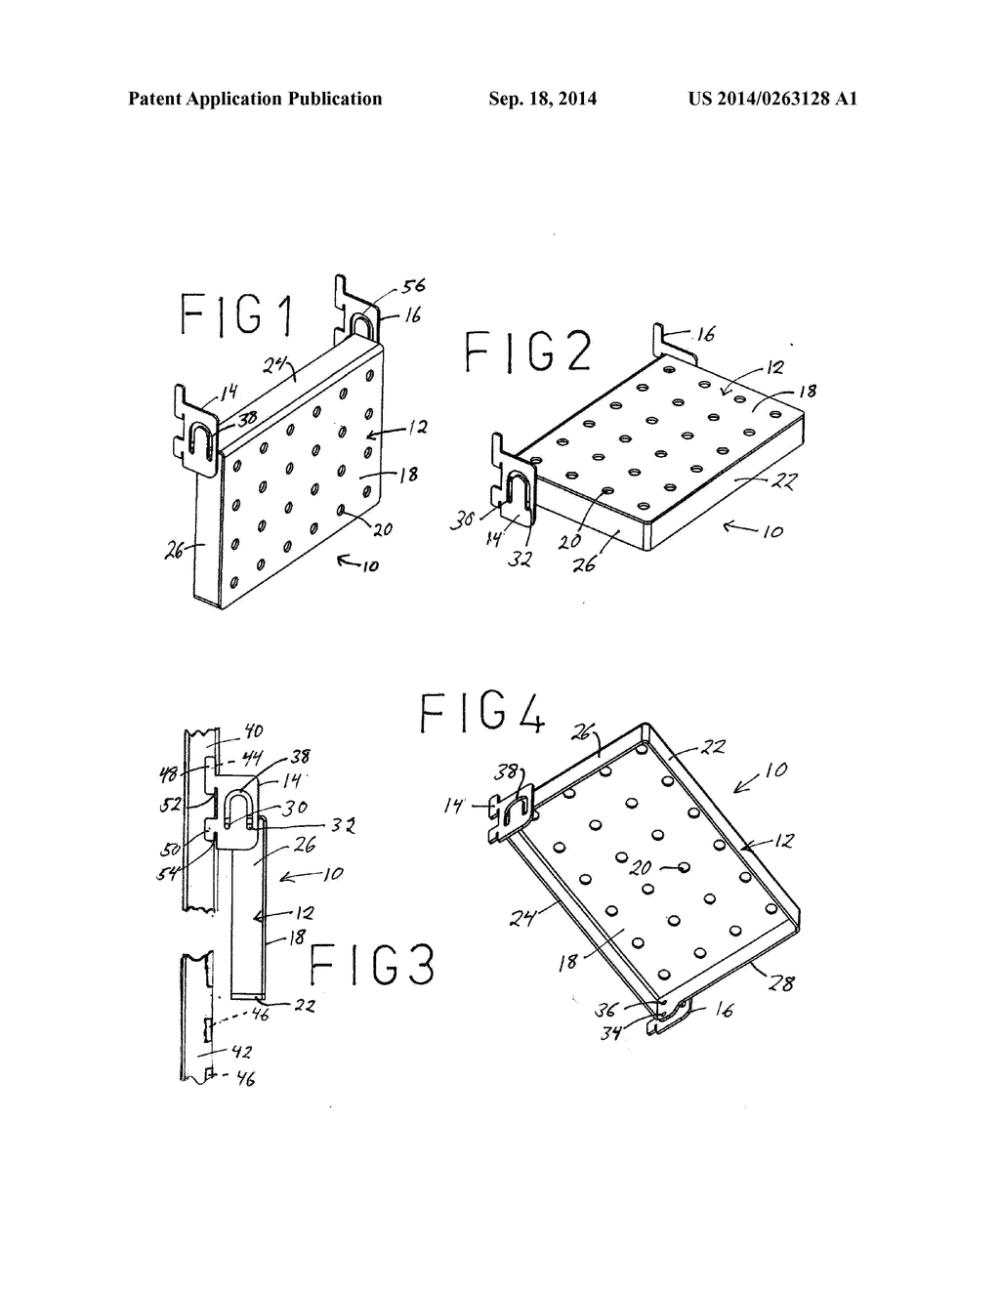 medium resolution of convertible gondola shelving diagram schematic and image 02diagram of gondola 19